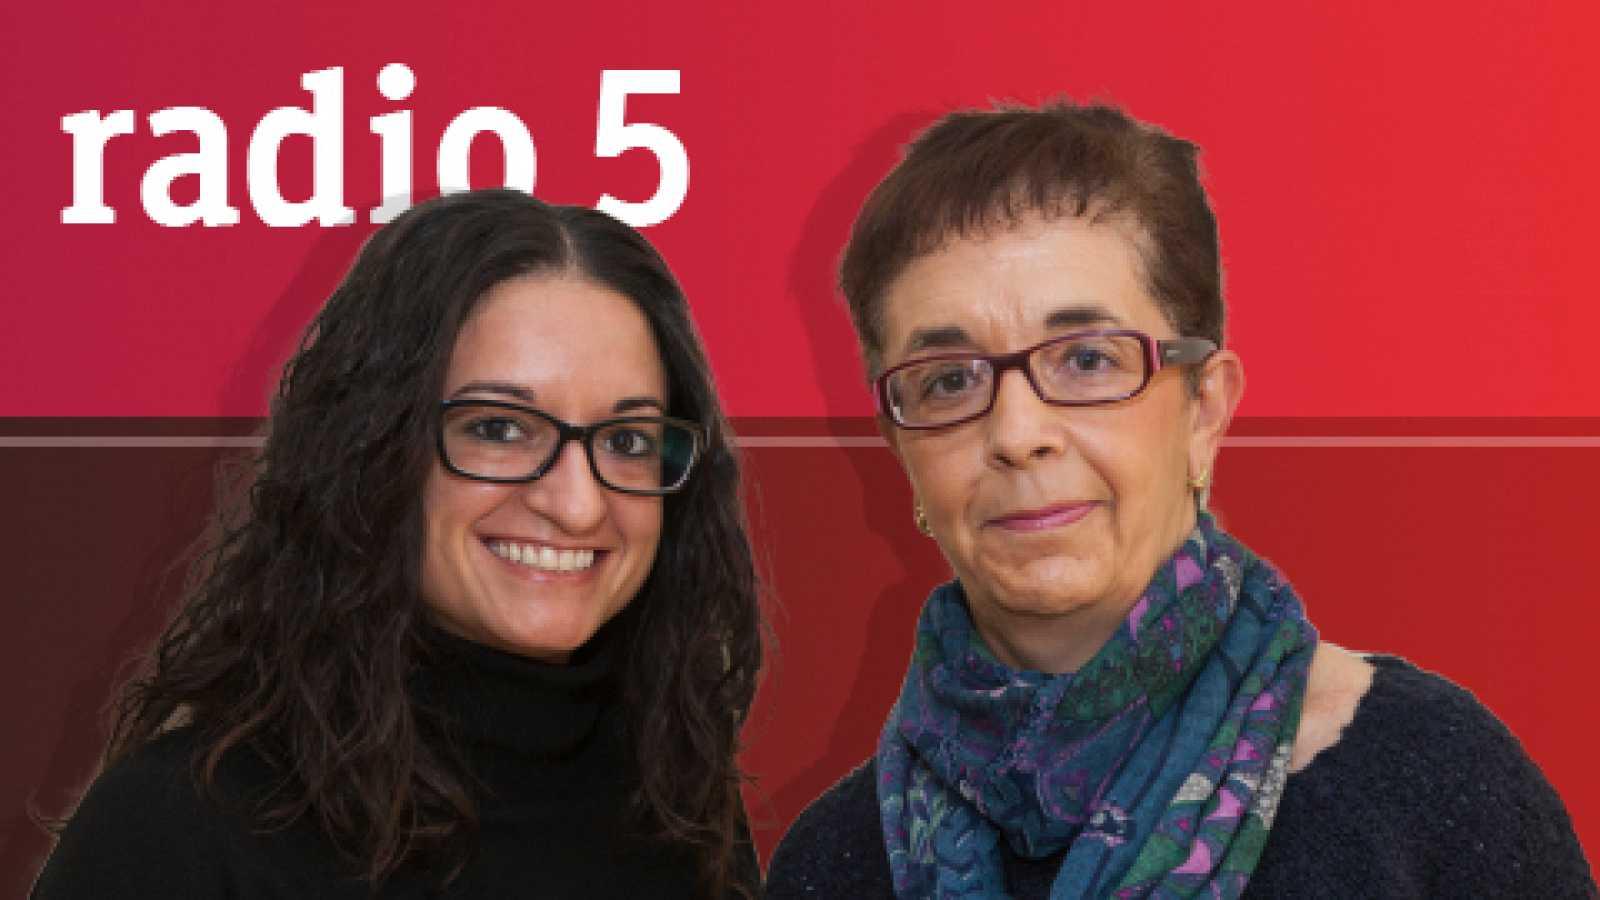 Cáceres capital española de la gastronomía 2015 - Matanza - 08/12/15 - escuchar ahora